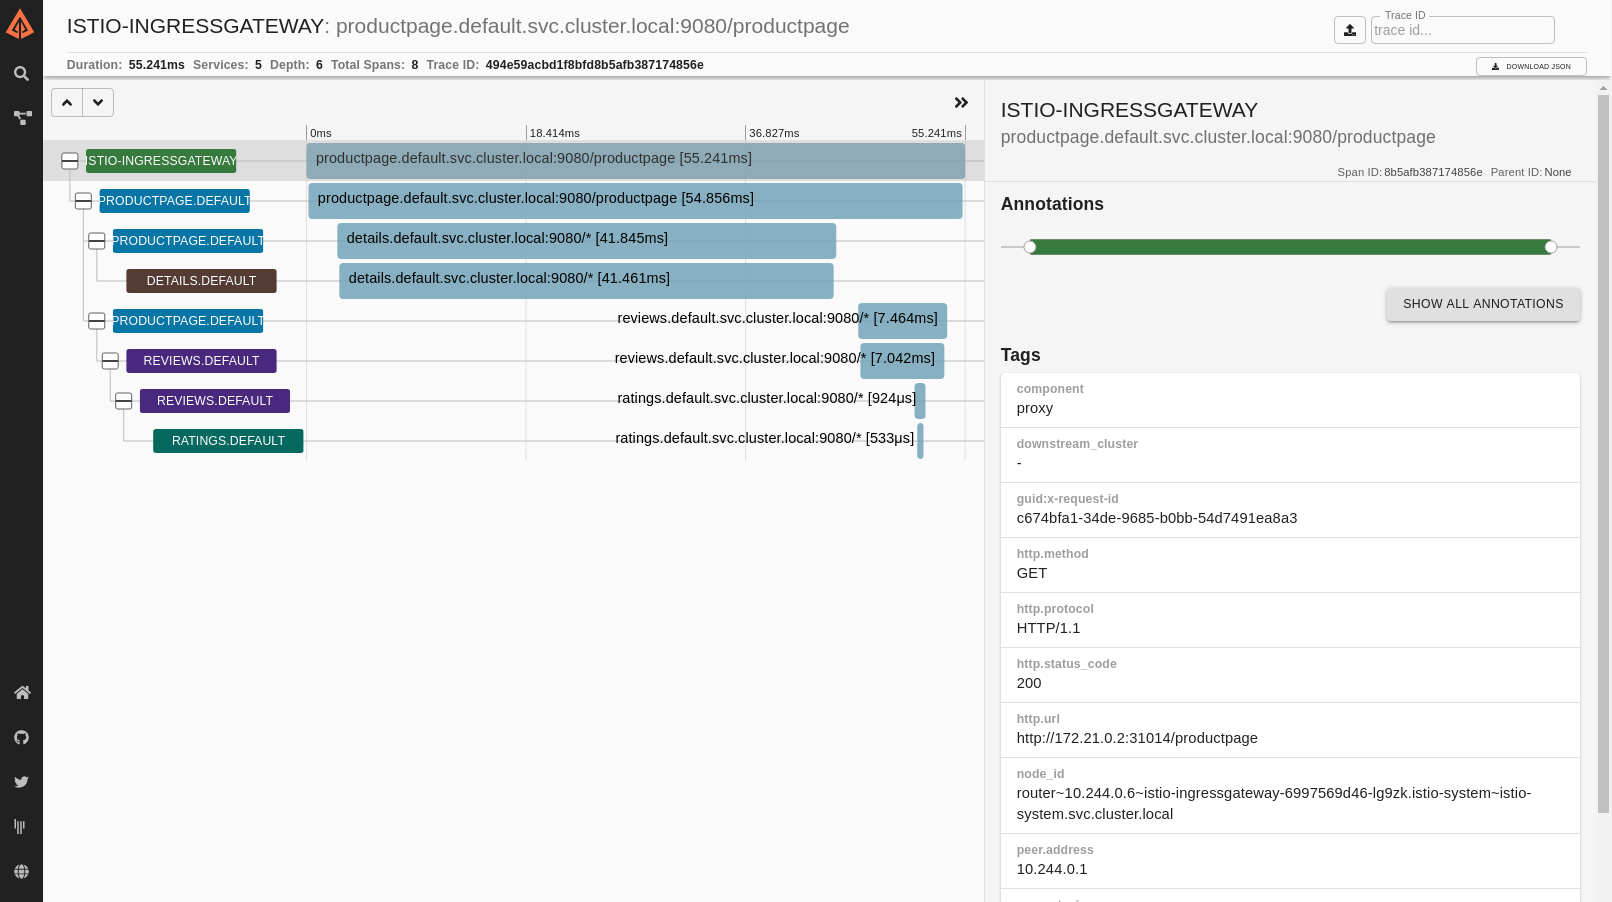 screenshot from Istio Zipkin UI